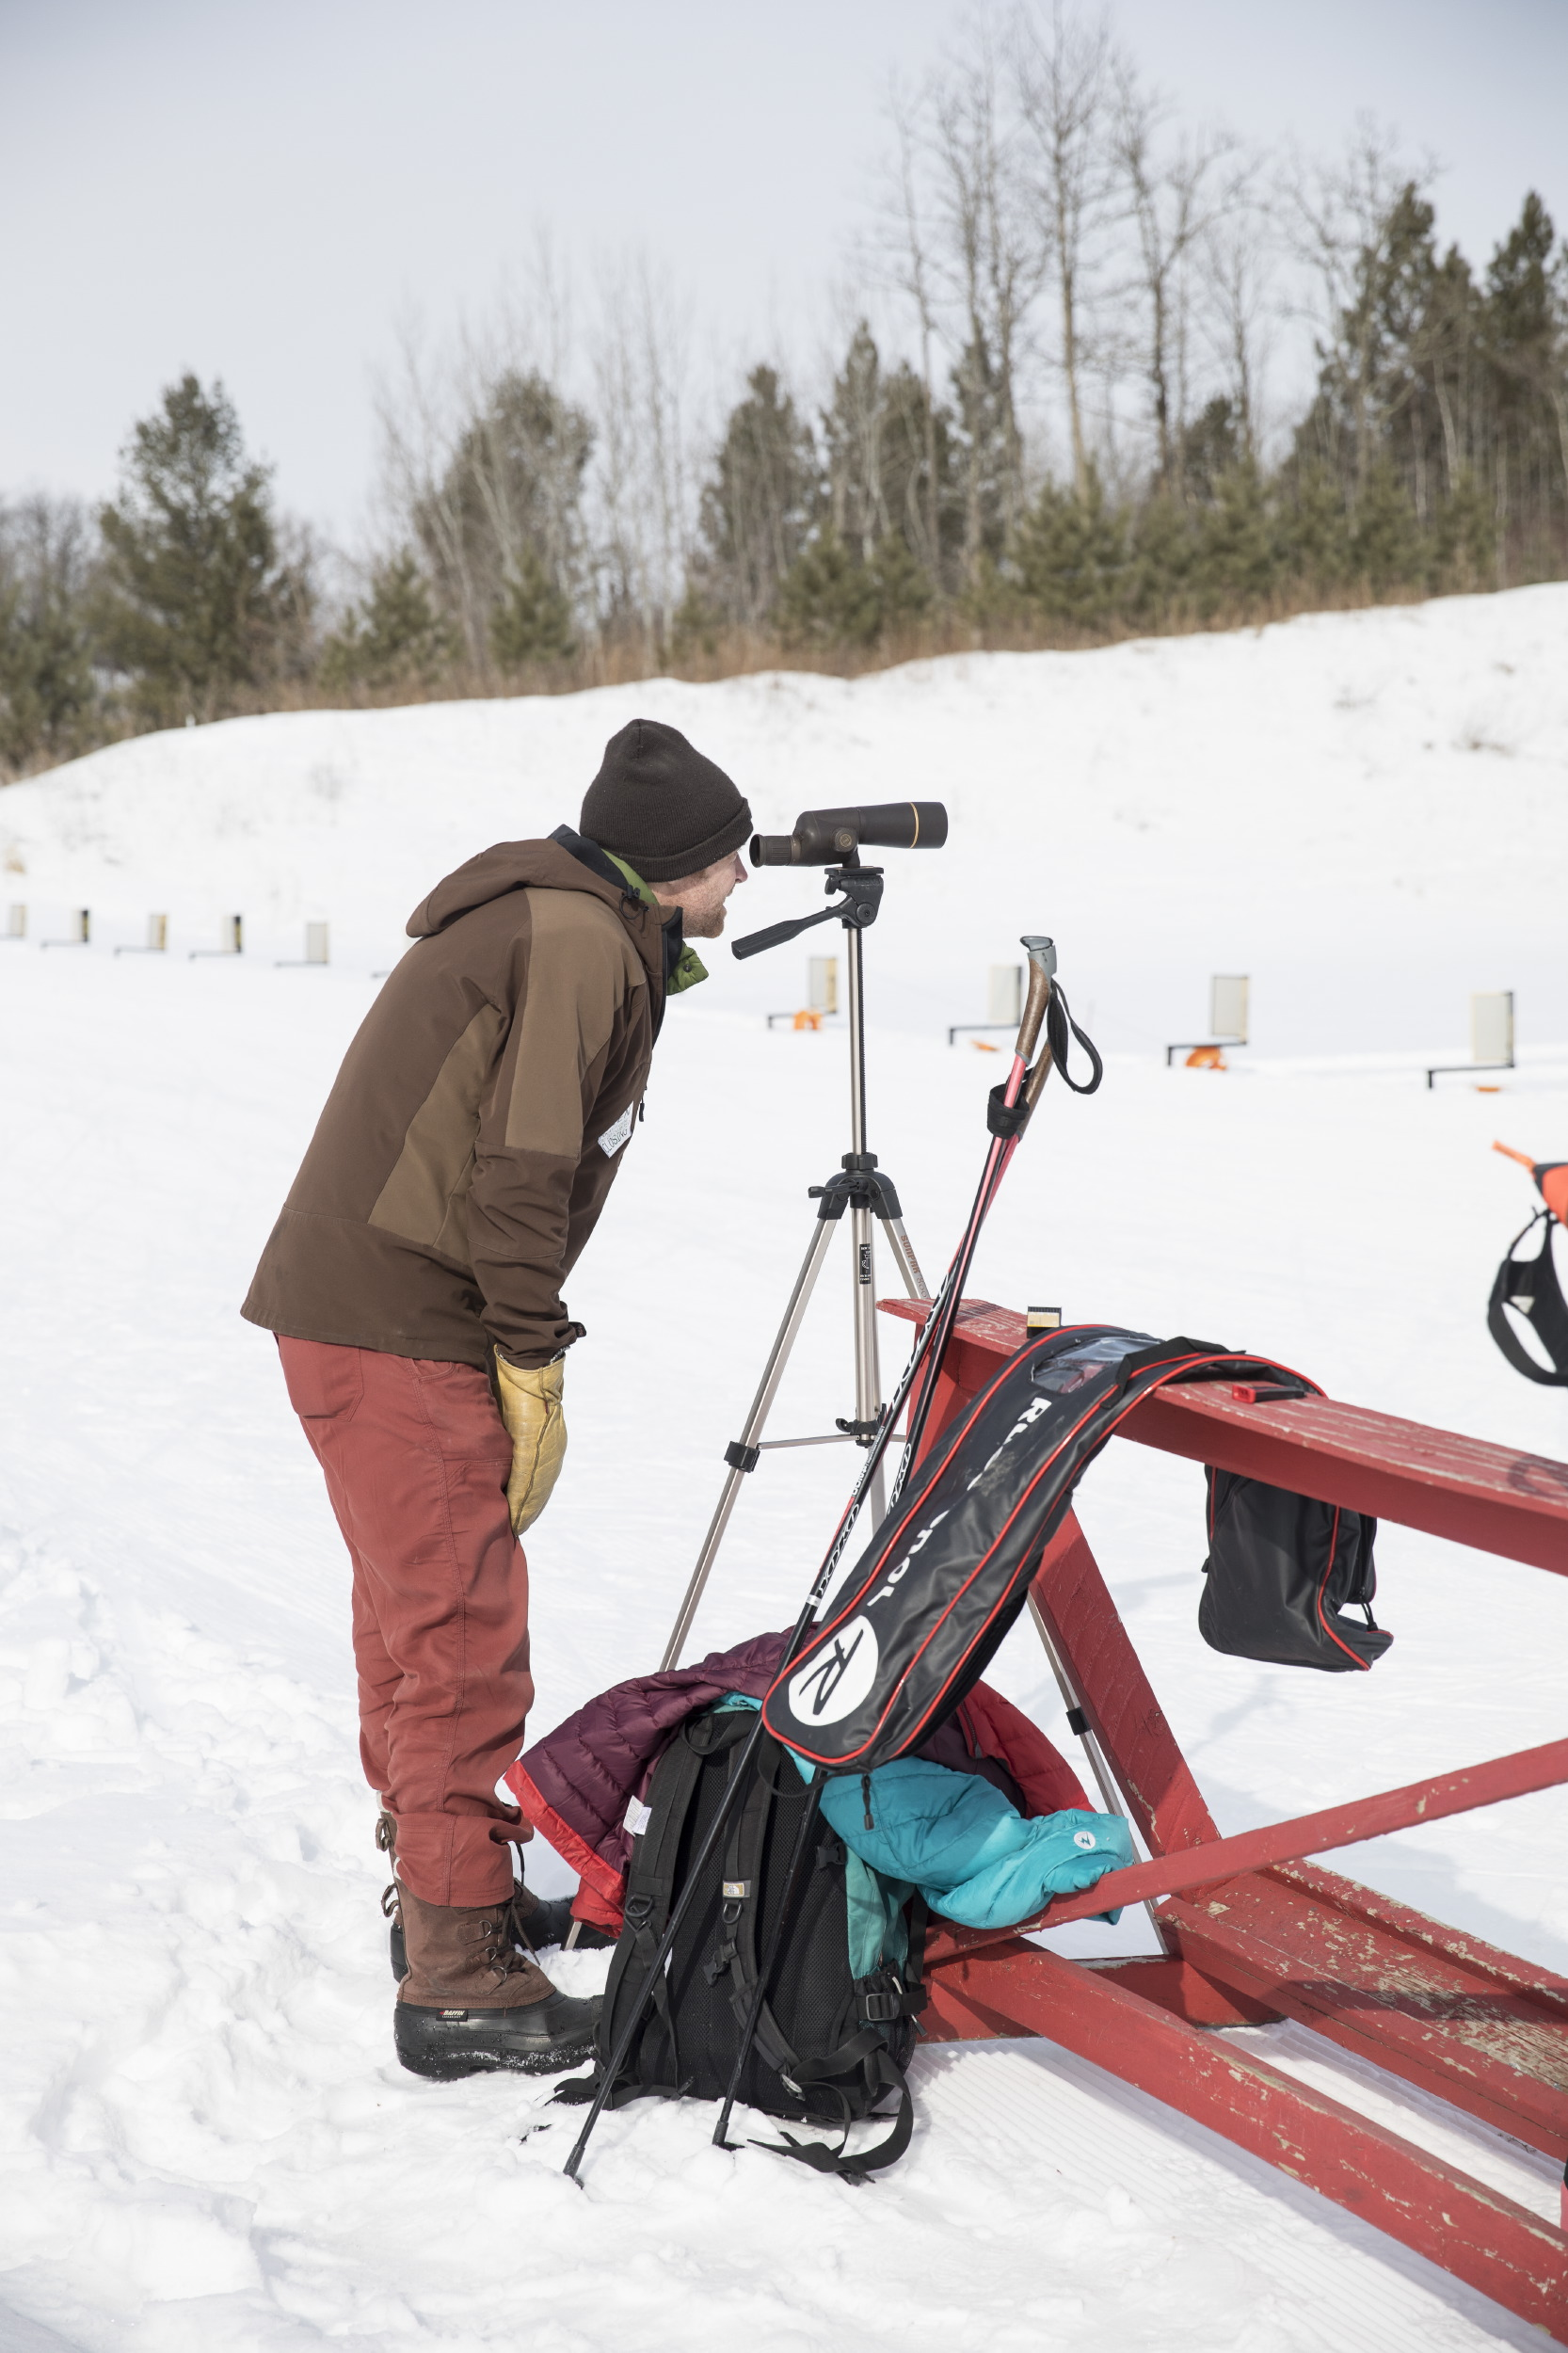 AckermanGruber_Skiing_01.JPG